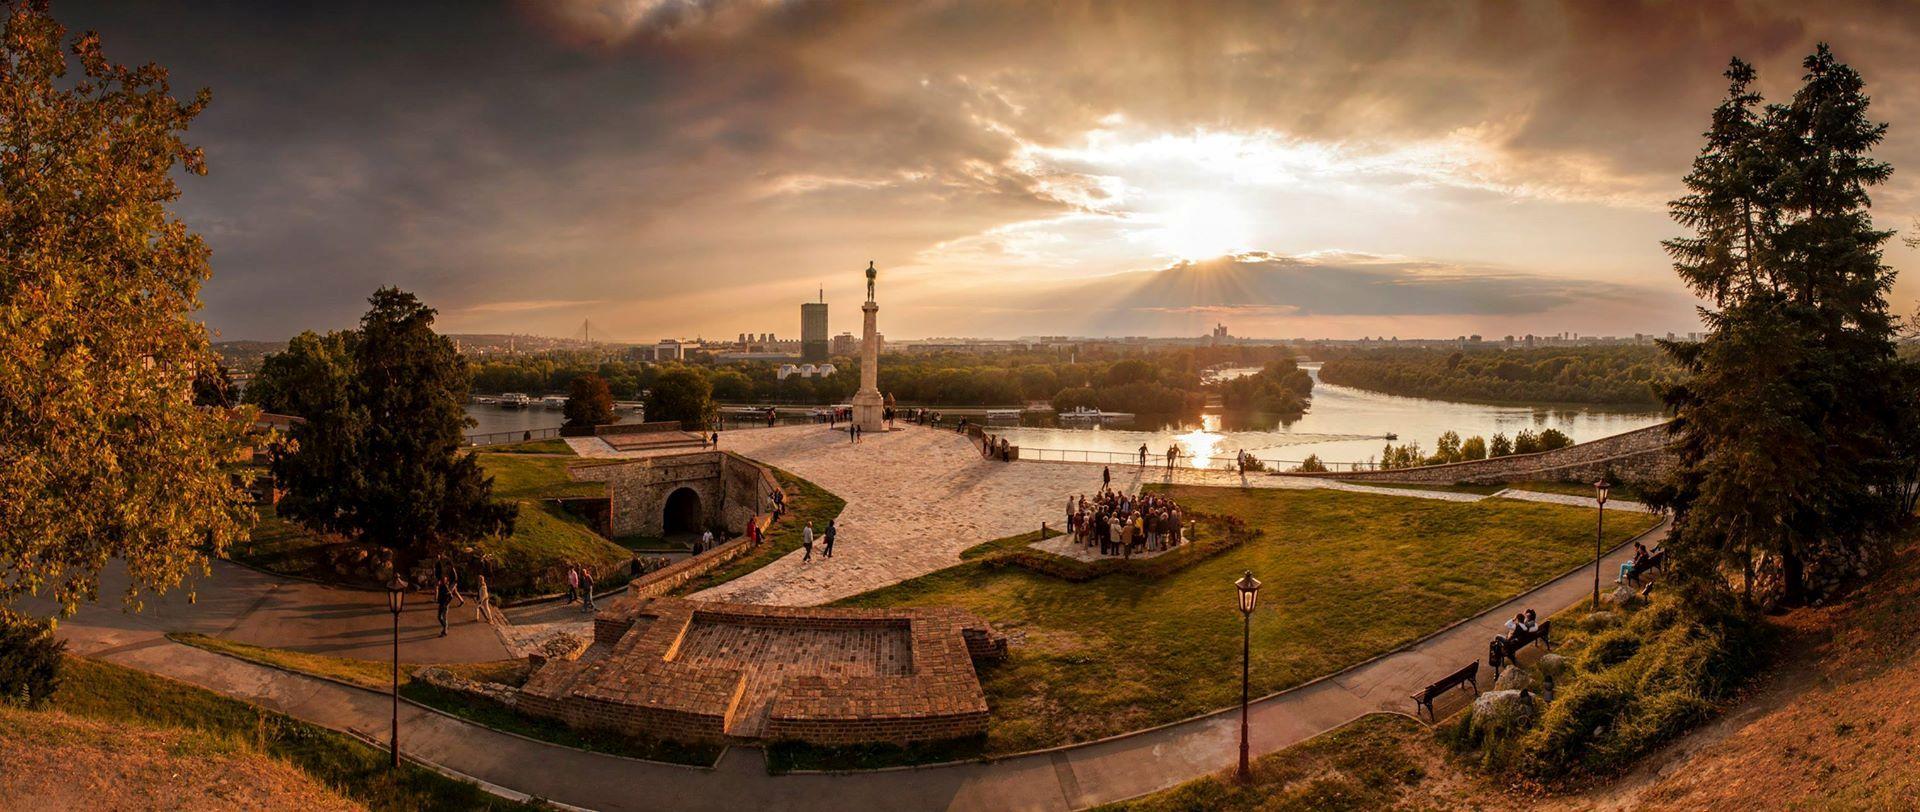 Most popular parks in belgrade kalemegdan